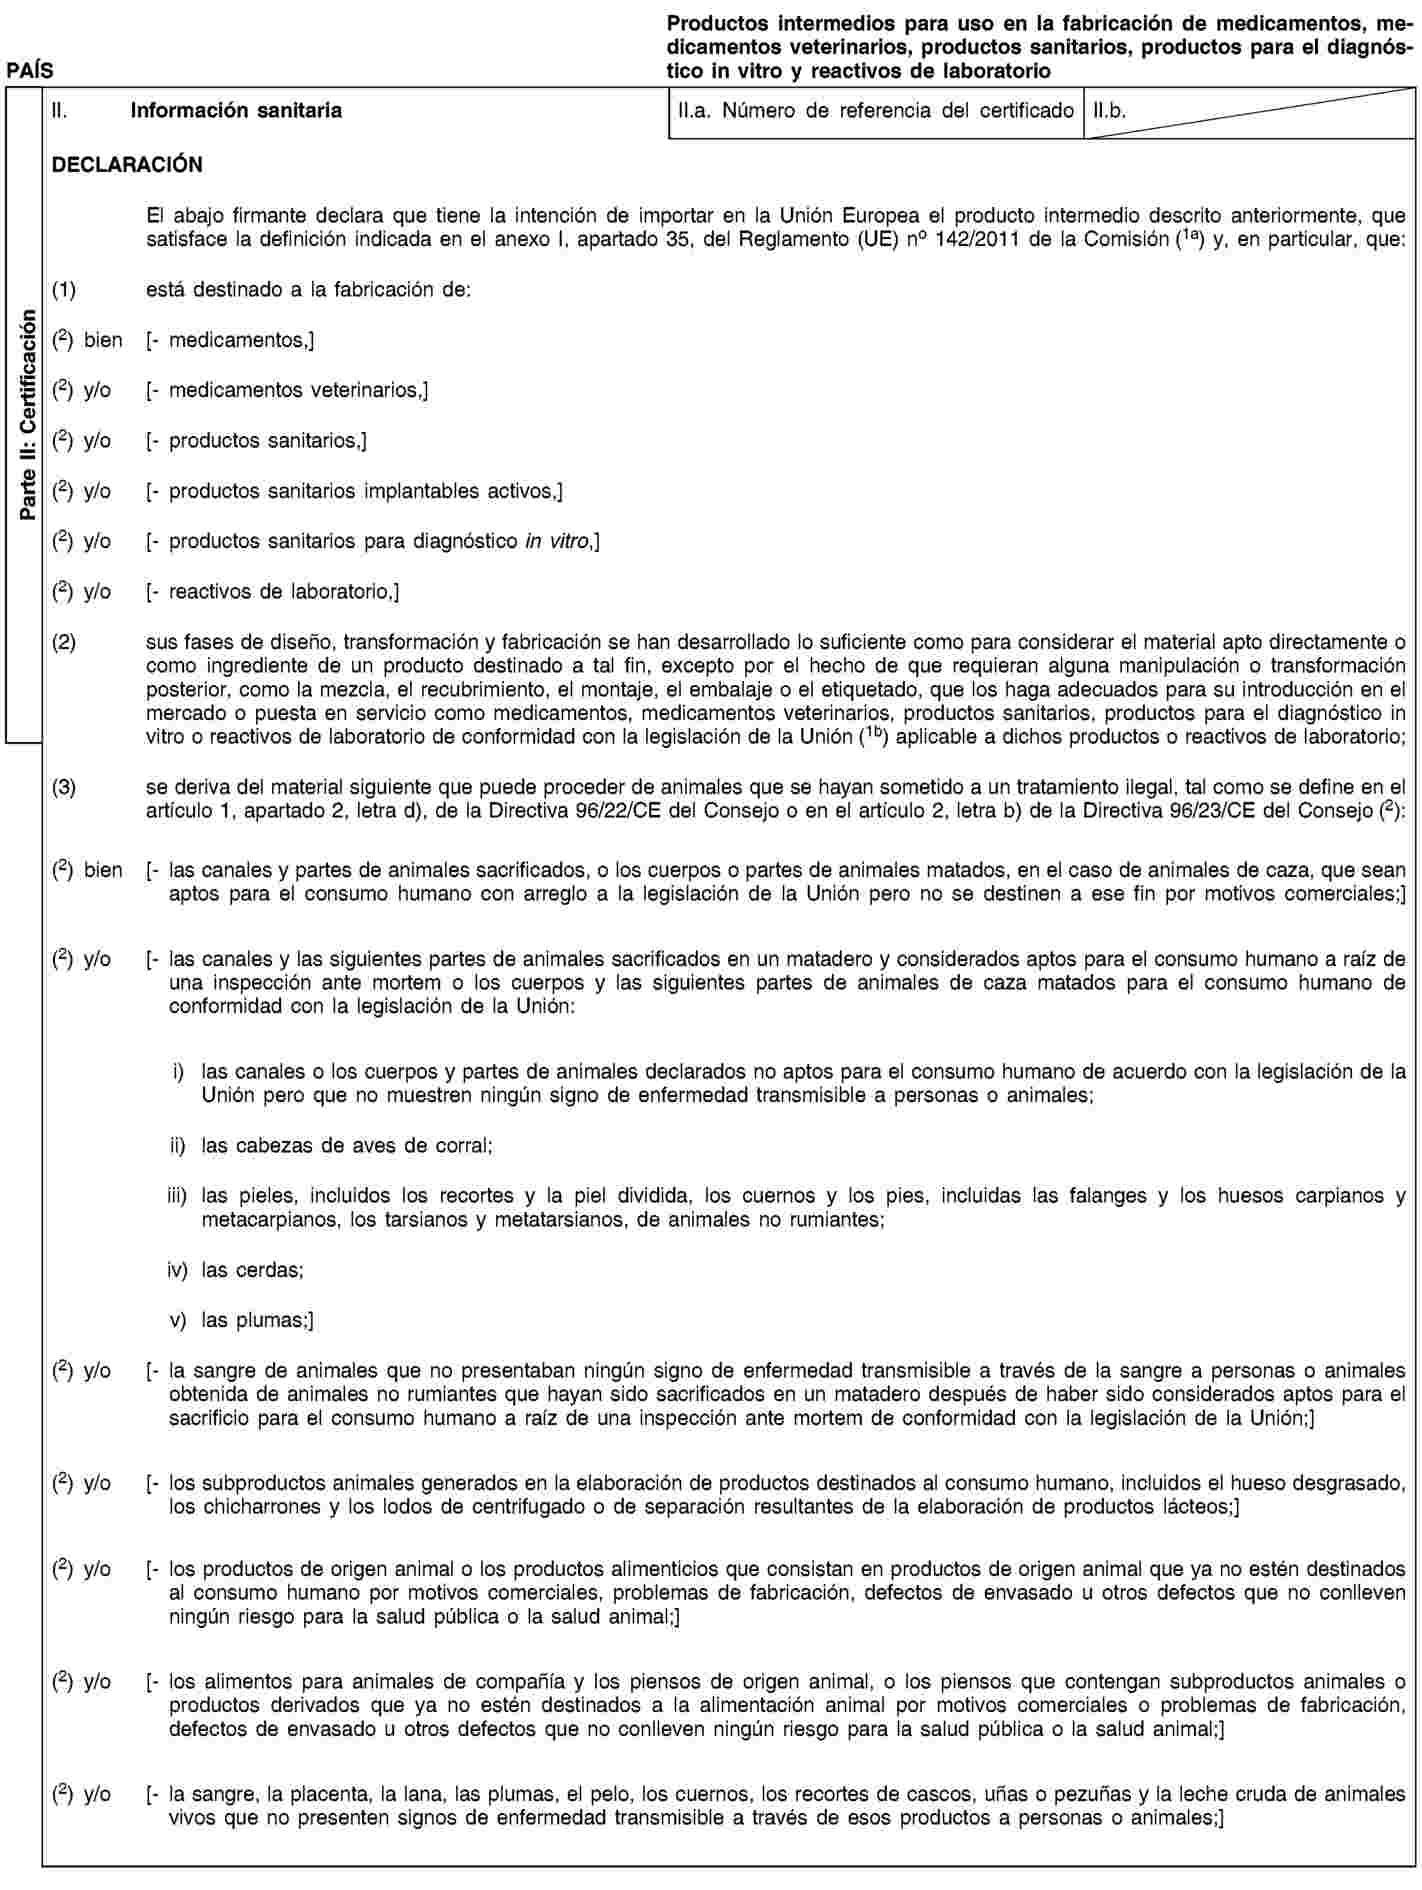 Imagen: https://eur-lex.europa.eu/resource.html?uri=uriserv:OJ.L_.2011.054.01.0001.01.SPA.xhtml.L_2011054ES.01024601.tif.jpg